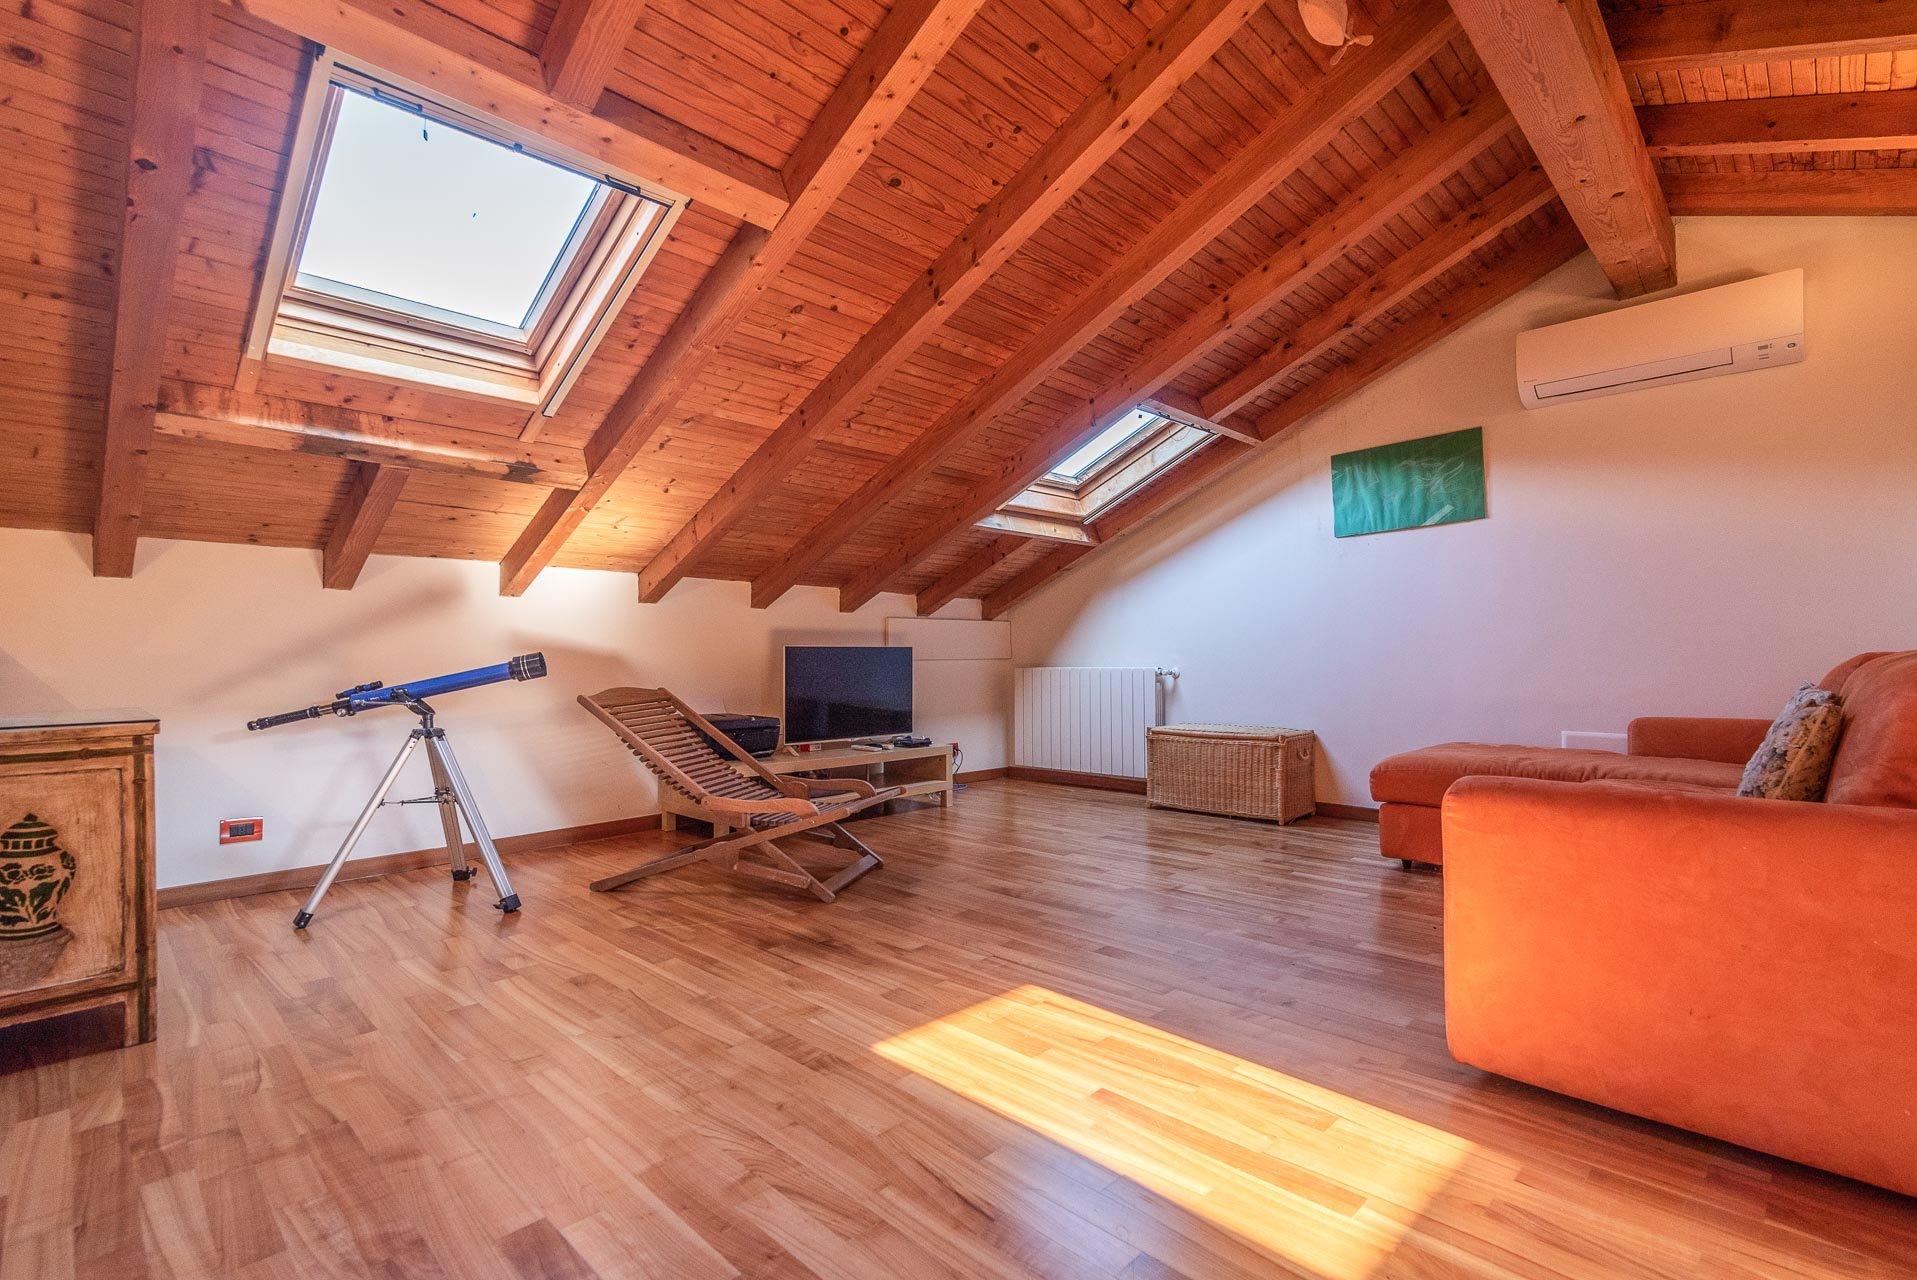 Semi-detached house for sale in Stresa - mansard